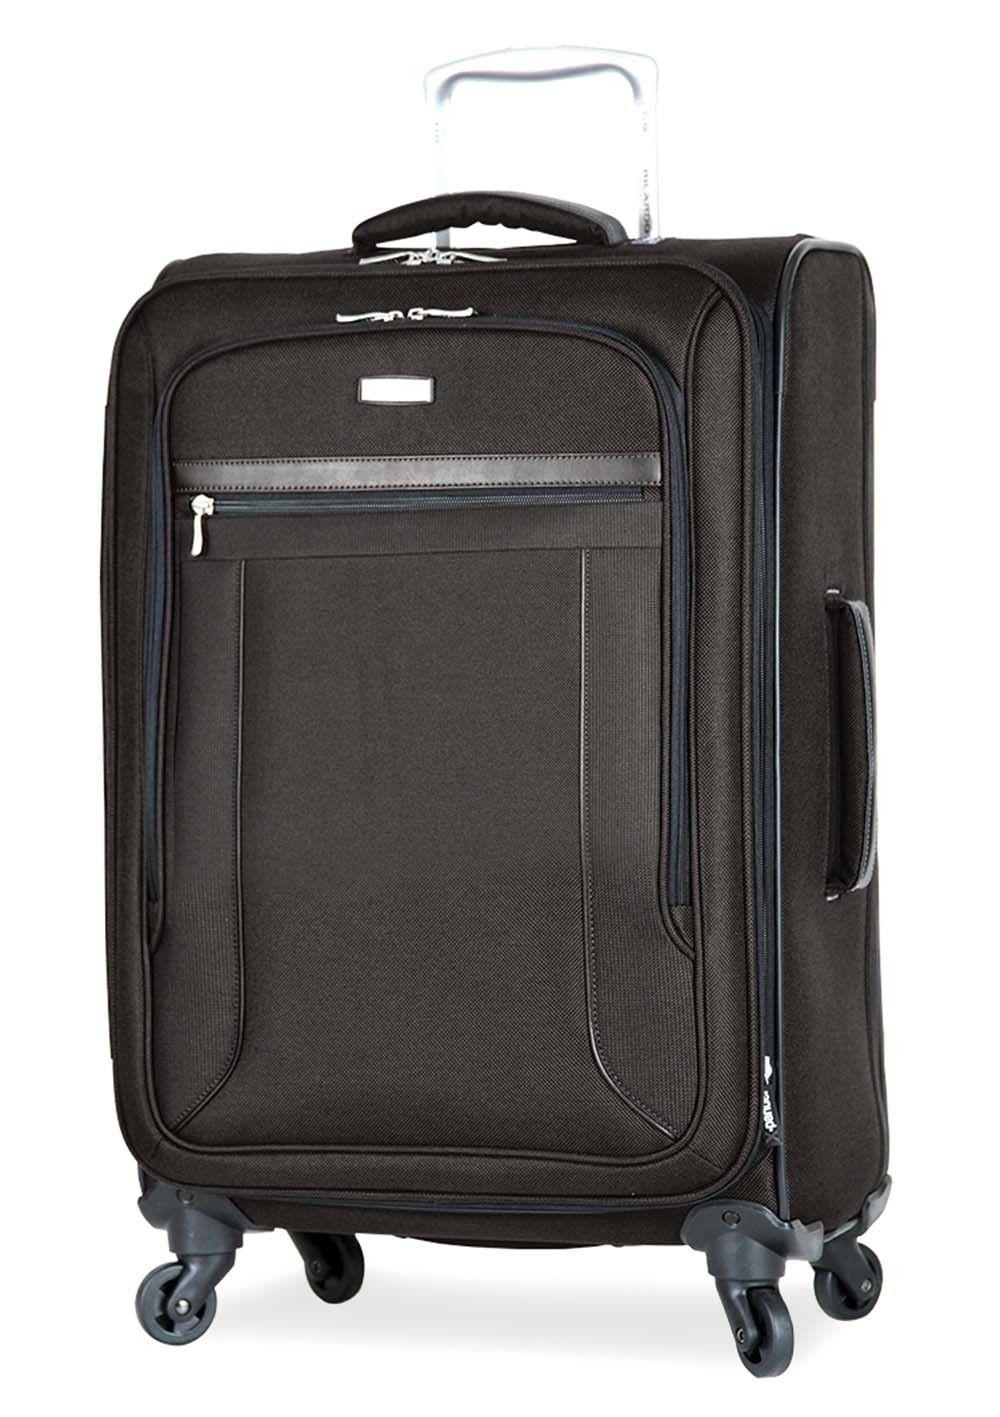 "Montecito Micro-Light 23.75"" Spinner Suitcase"